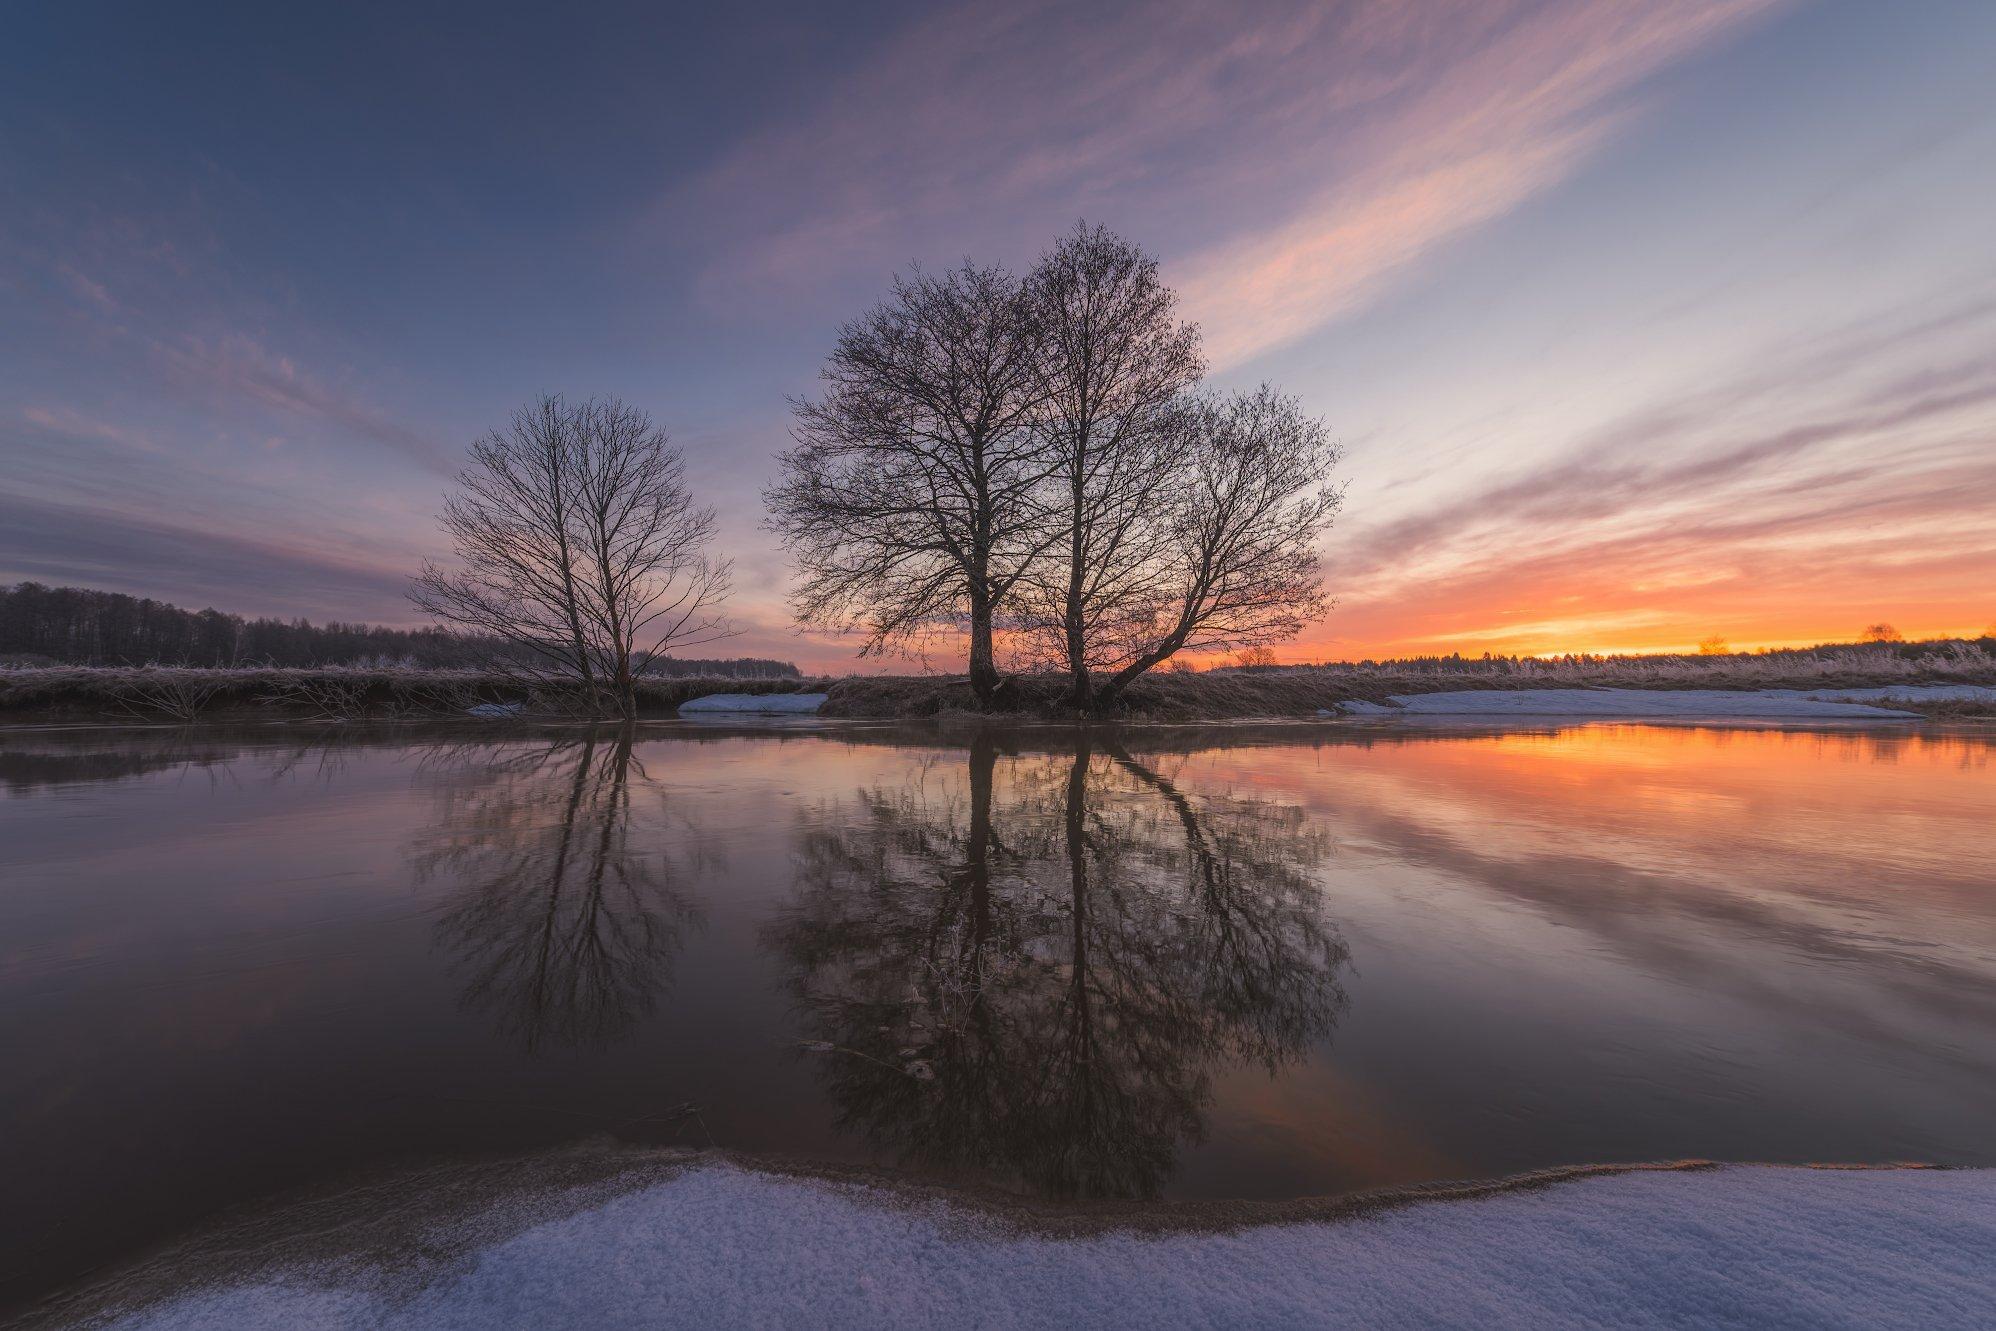 рассвет, река, утро, весна, Левыкин Виталий